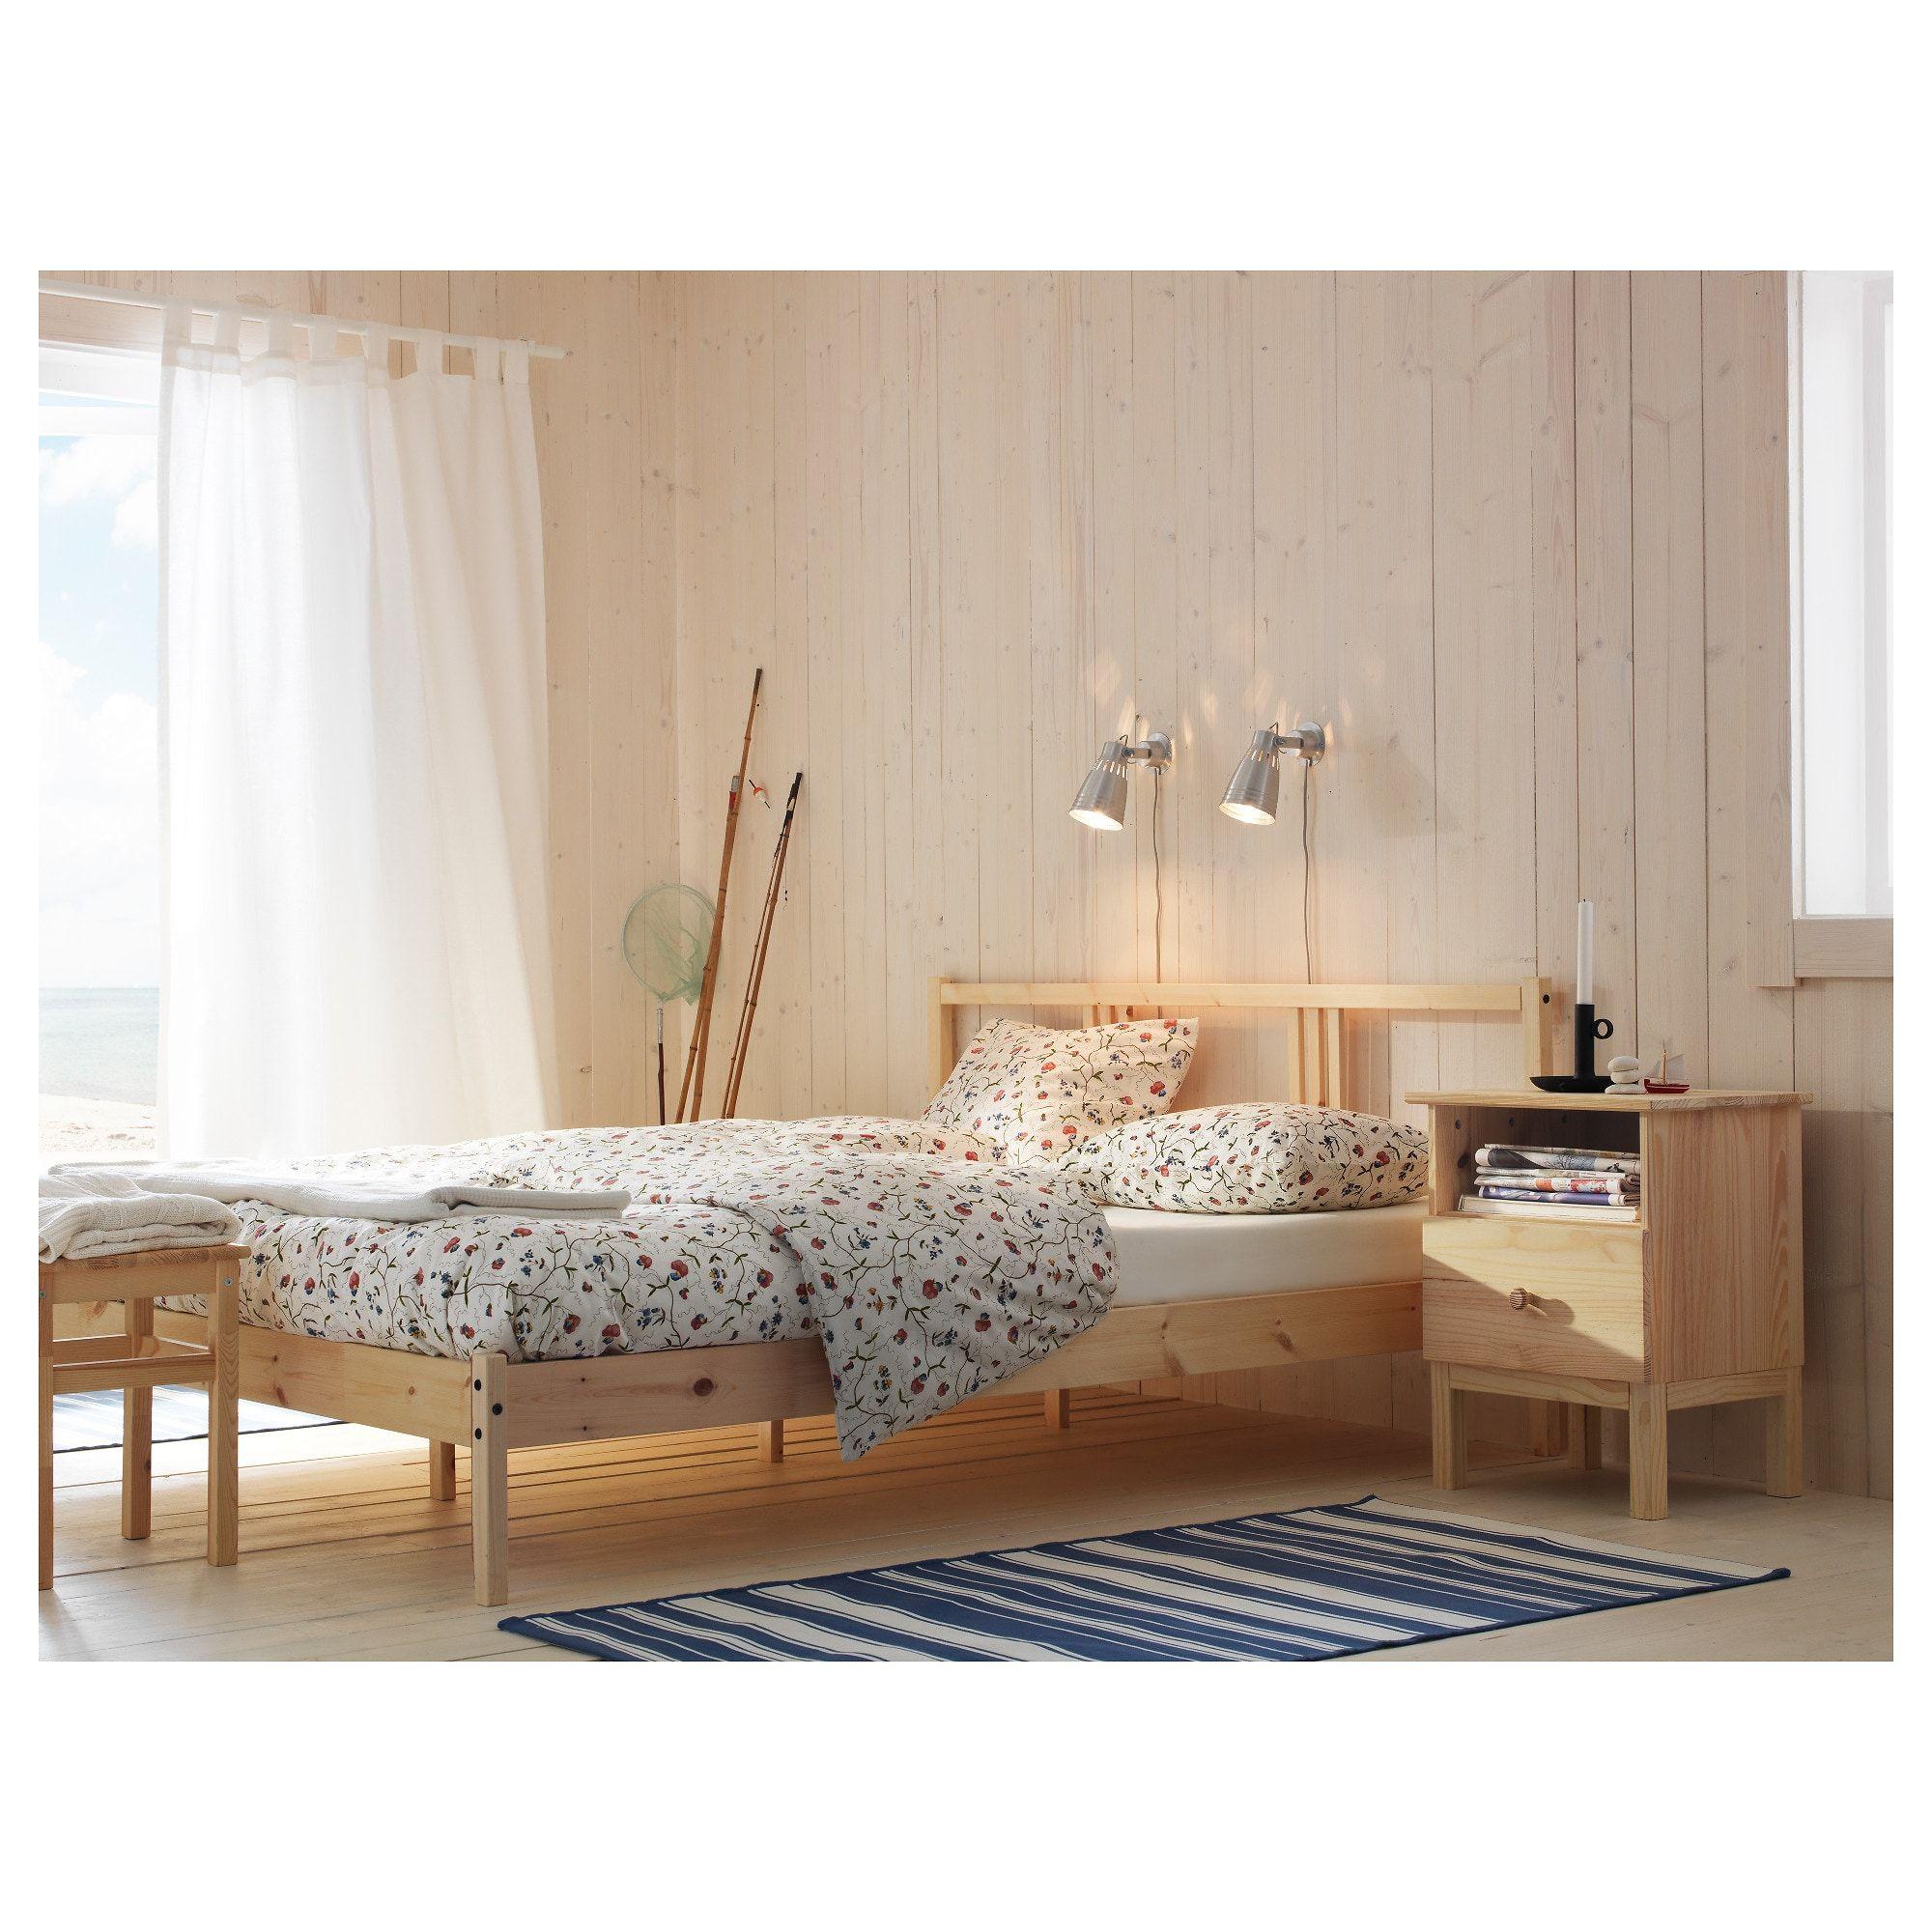 Tempat Tidur Ikea